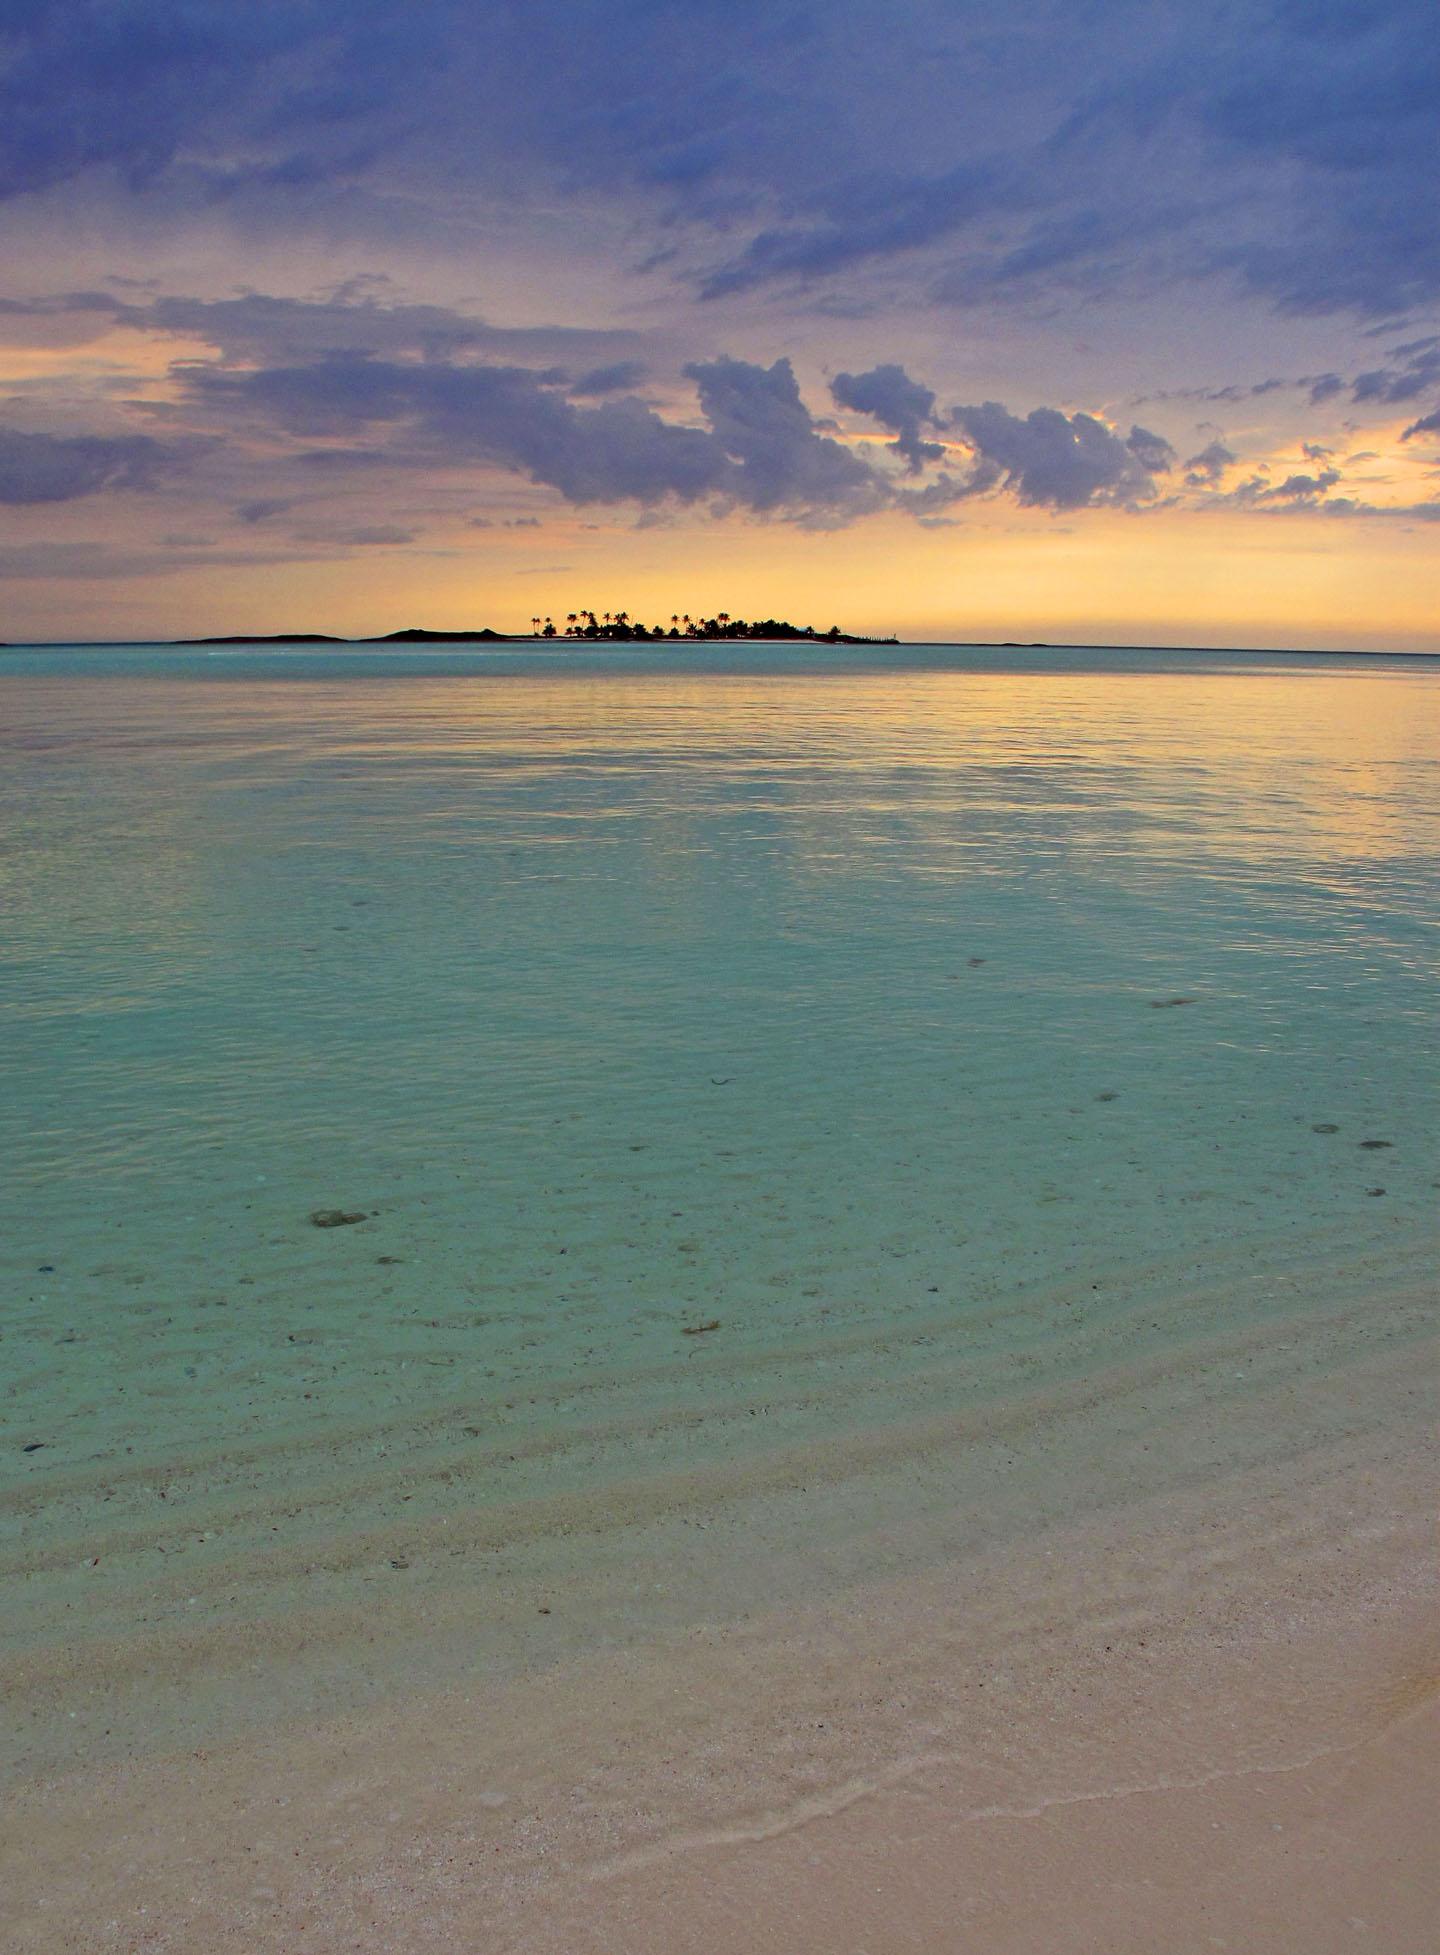 Sunrise over Pelican Cay - Abaco, Bahamas.